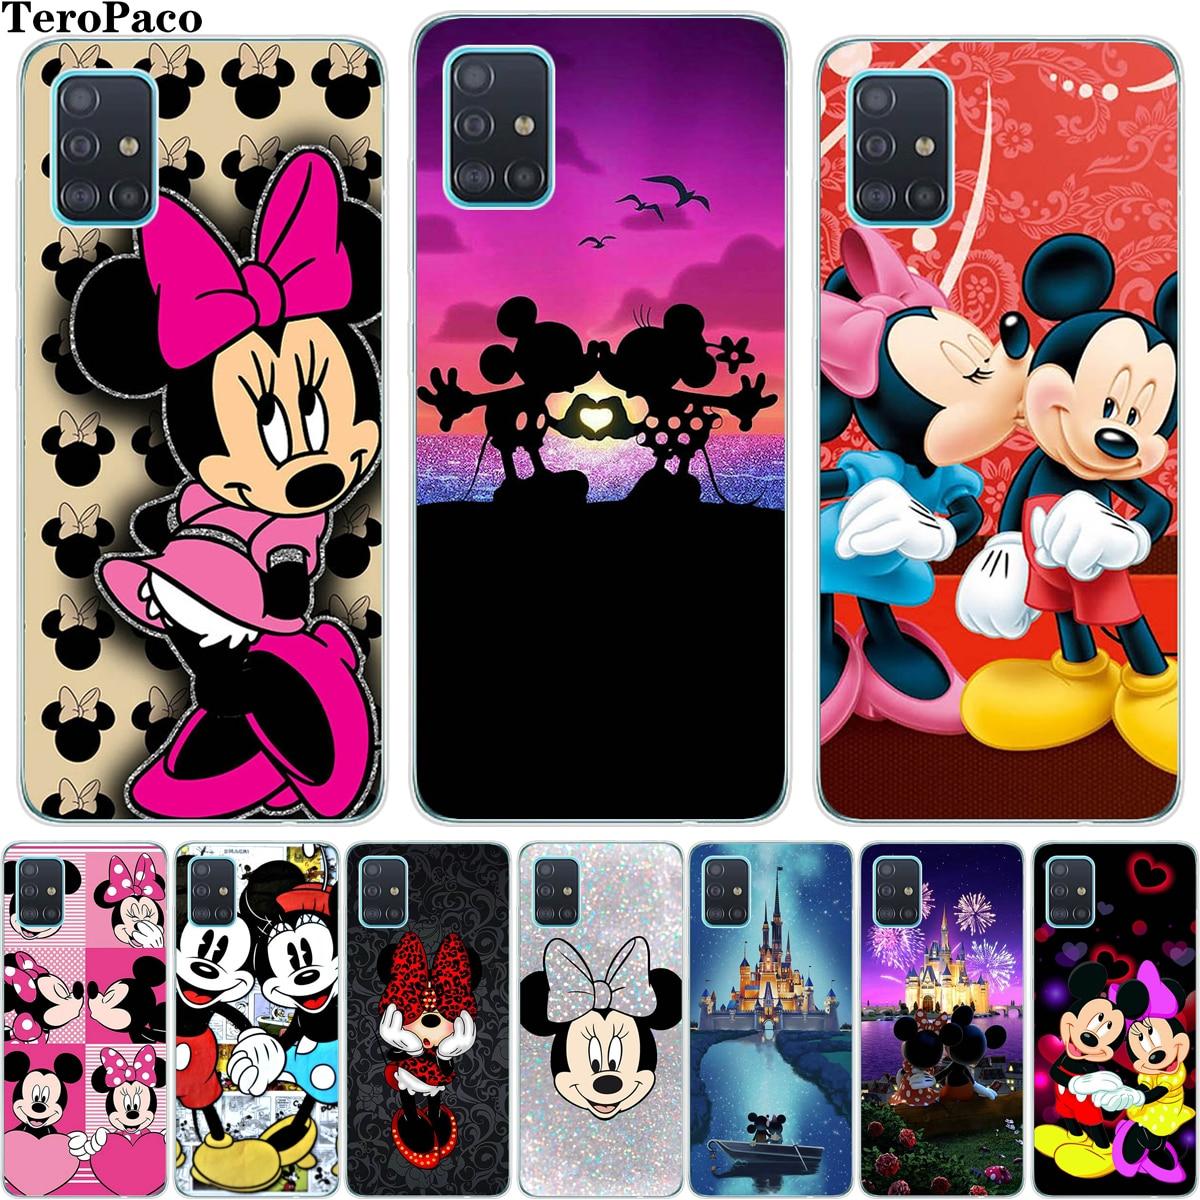 Cartoon Mickey Minn Soft Silicon TPU Phone Case For Samsung Galaxy A01 A51 A71 A81 A91 S20 Plus Ultra For S20ultra S20plus Cover